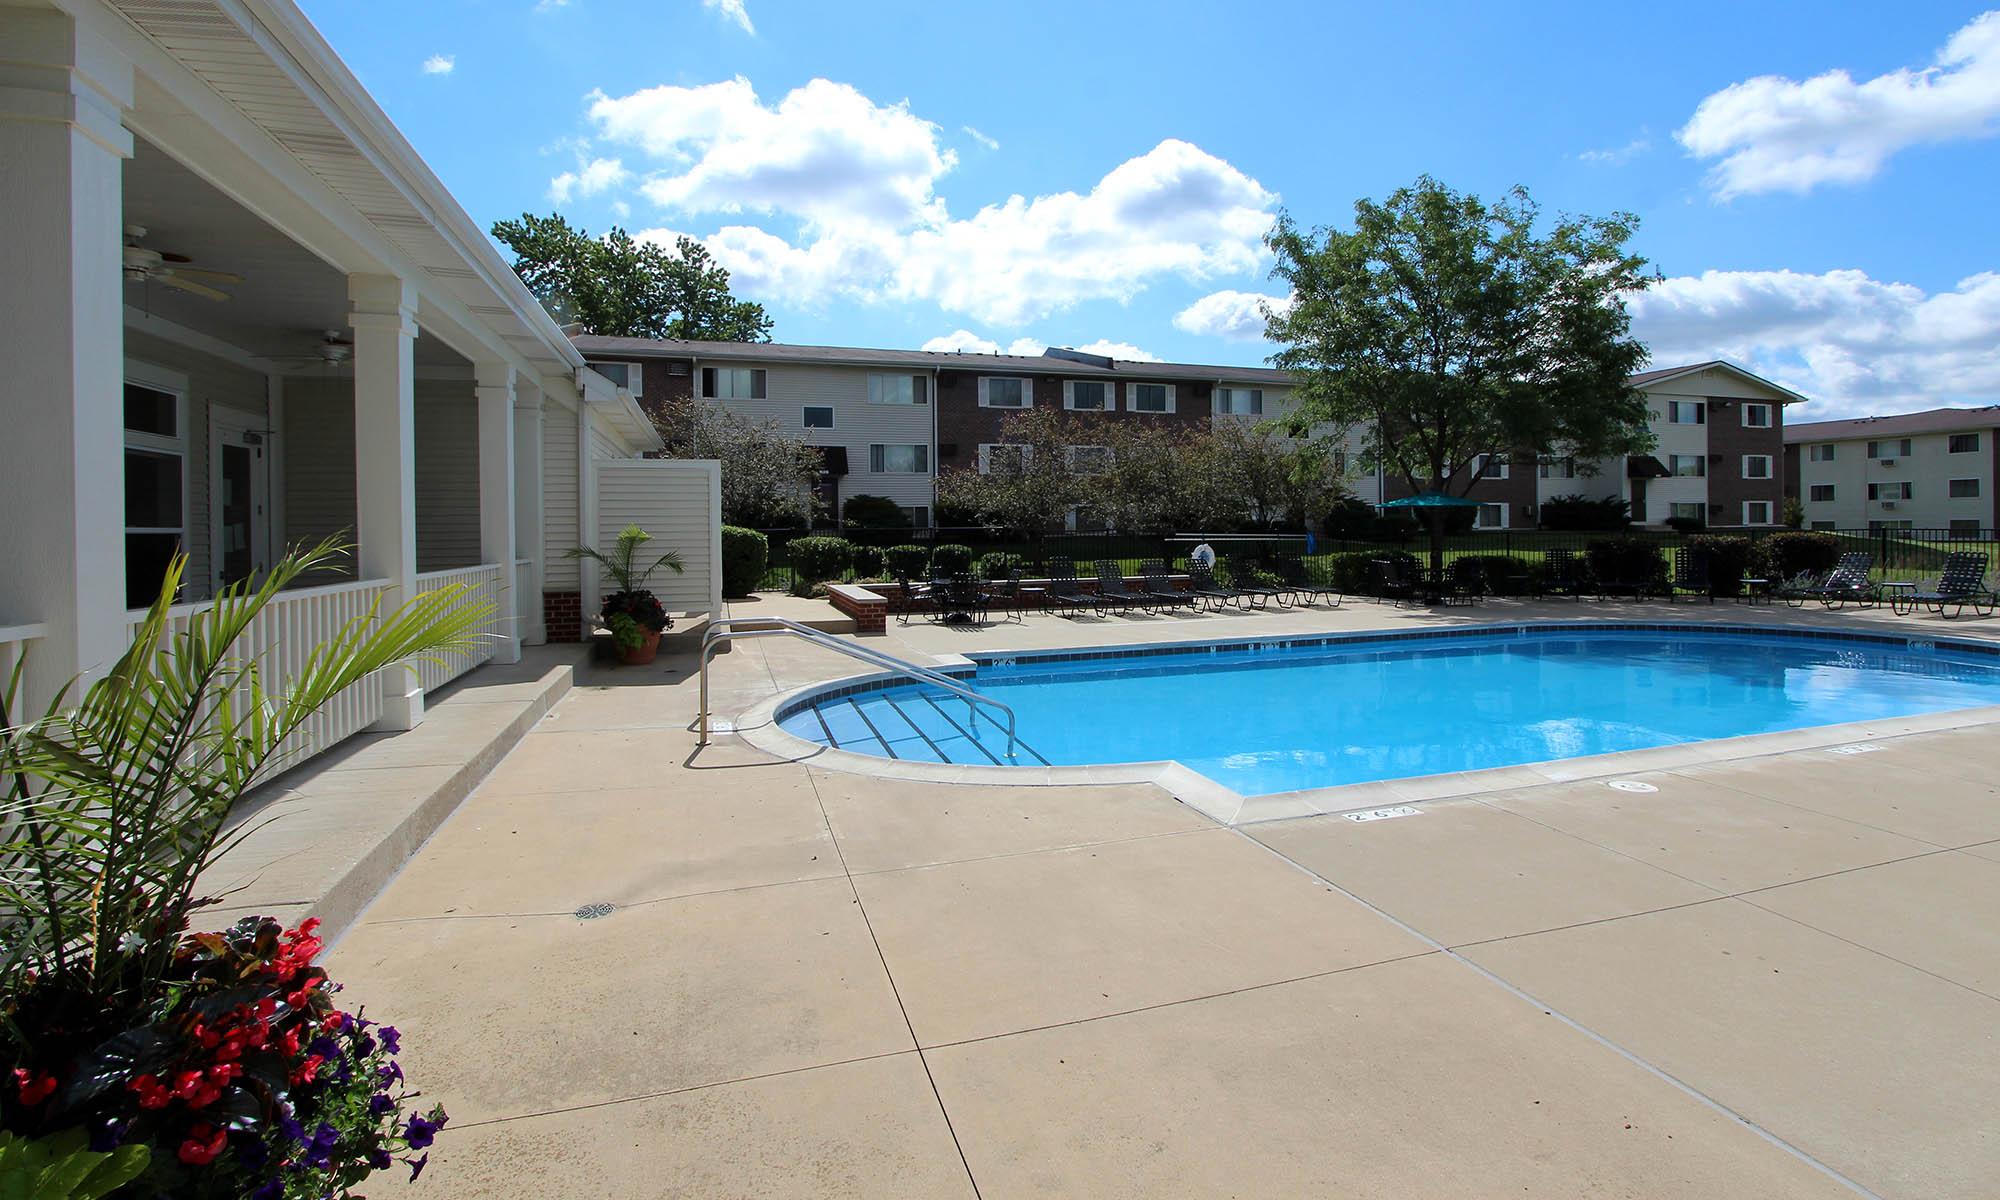 Apartments in Bolingbrook, IL